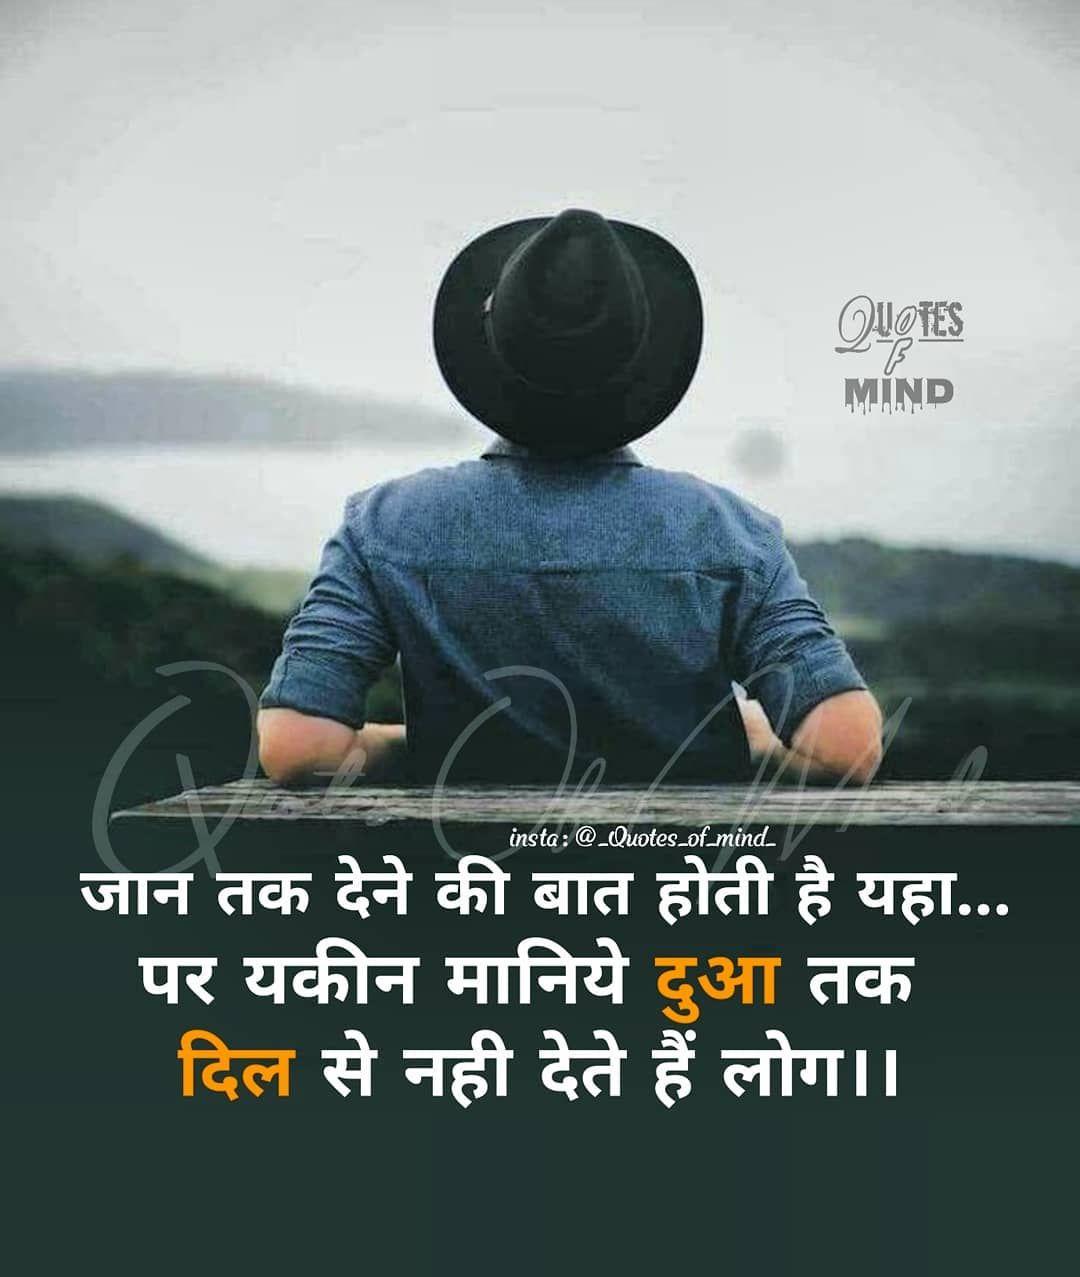 Hindi Motivational Quotes Inspirational Quotes In Hindi Page 7 Brain Hack Quotes Inspirational Quotes In Hindi Hindi Quotes Motivational Quotes